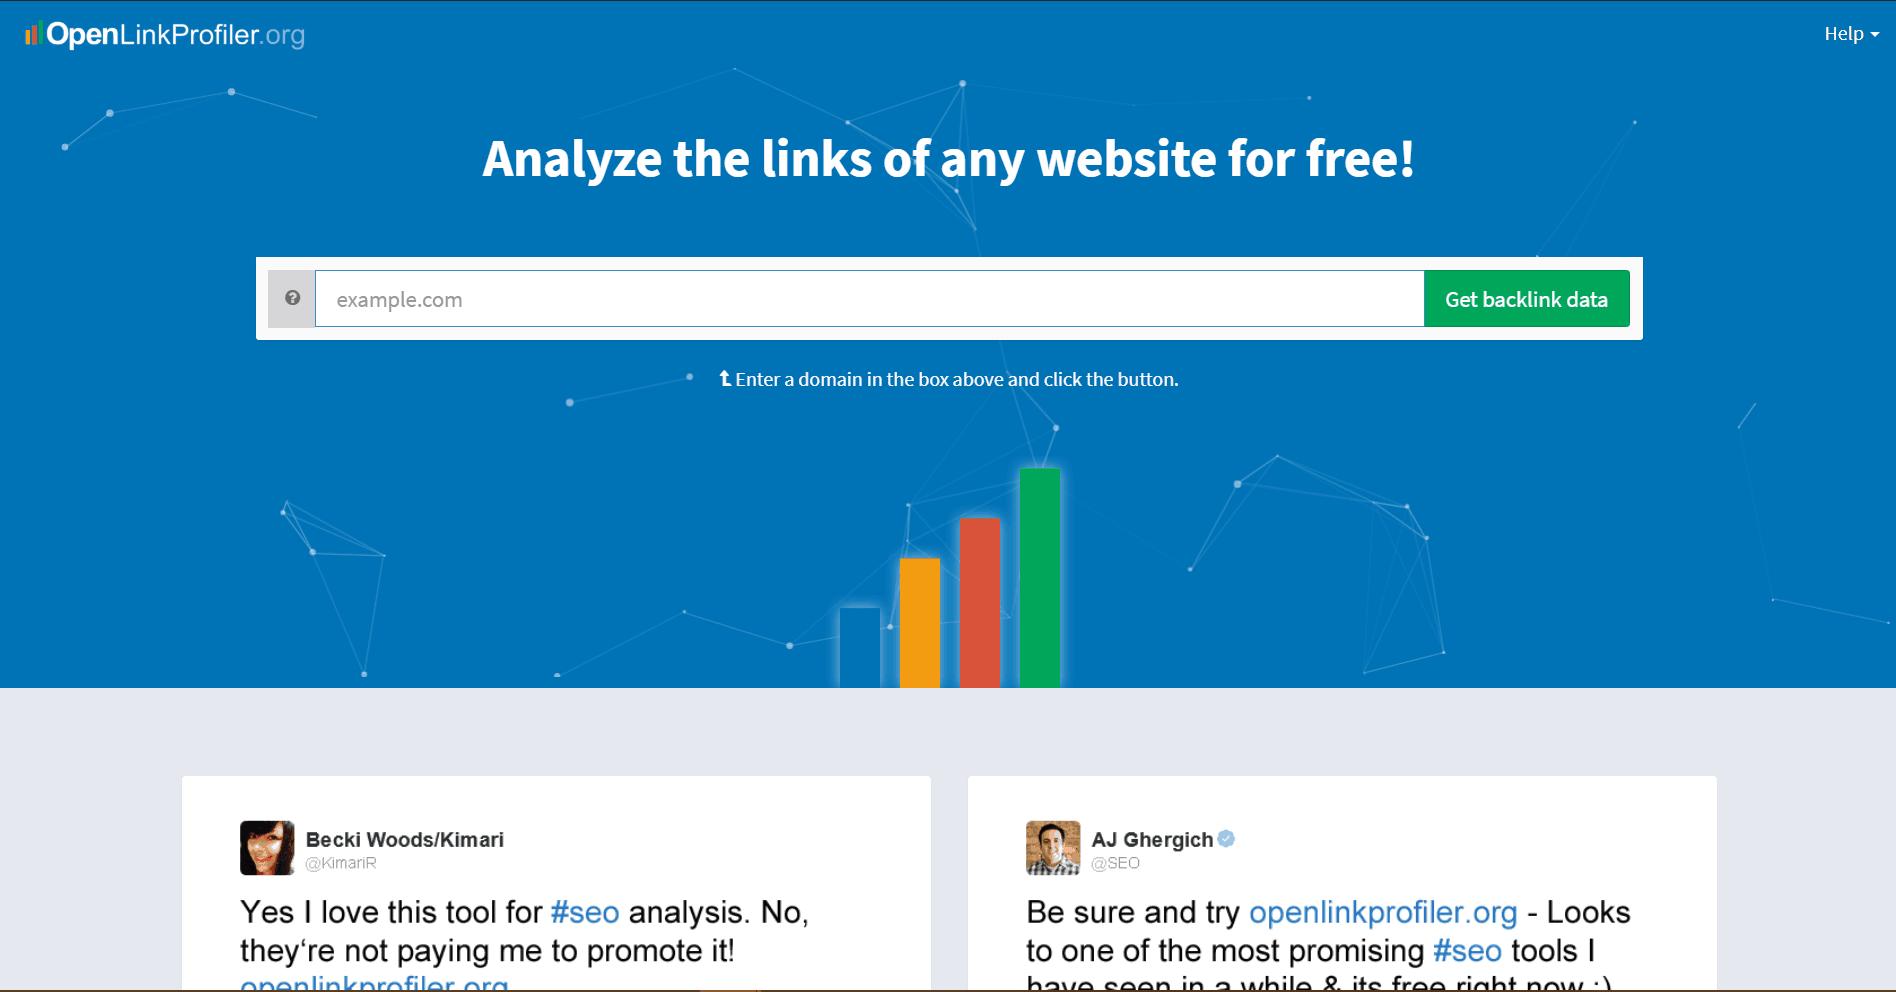 OpenLinkProfiler Backlink Analysis Tool